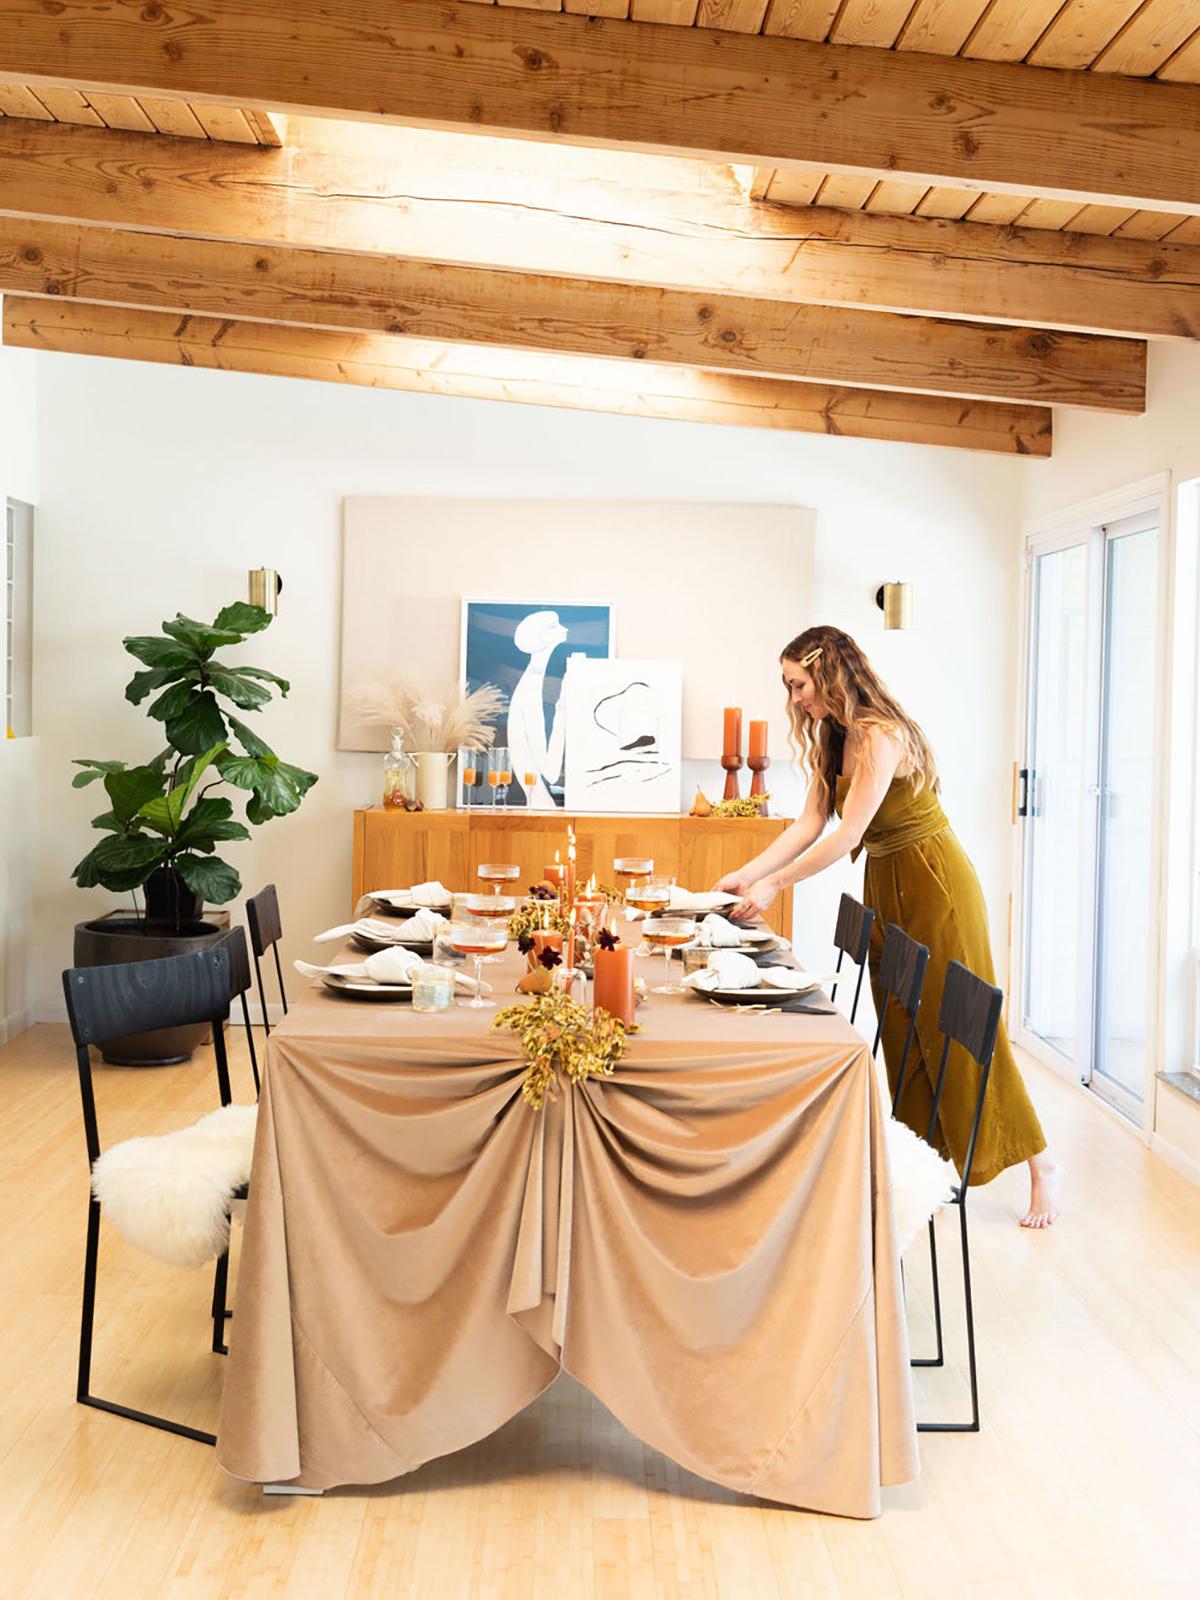 Kendra Kimball Dining Table